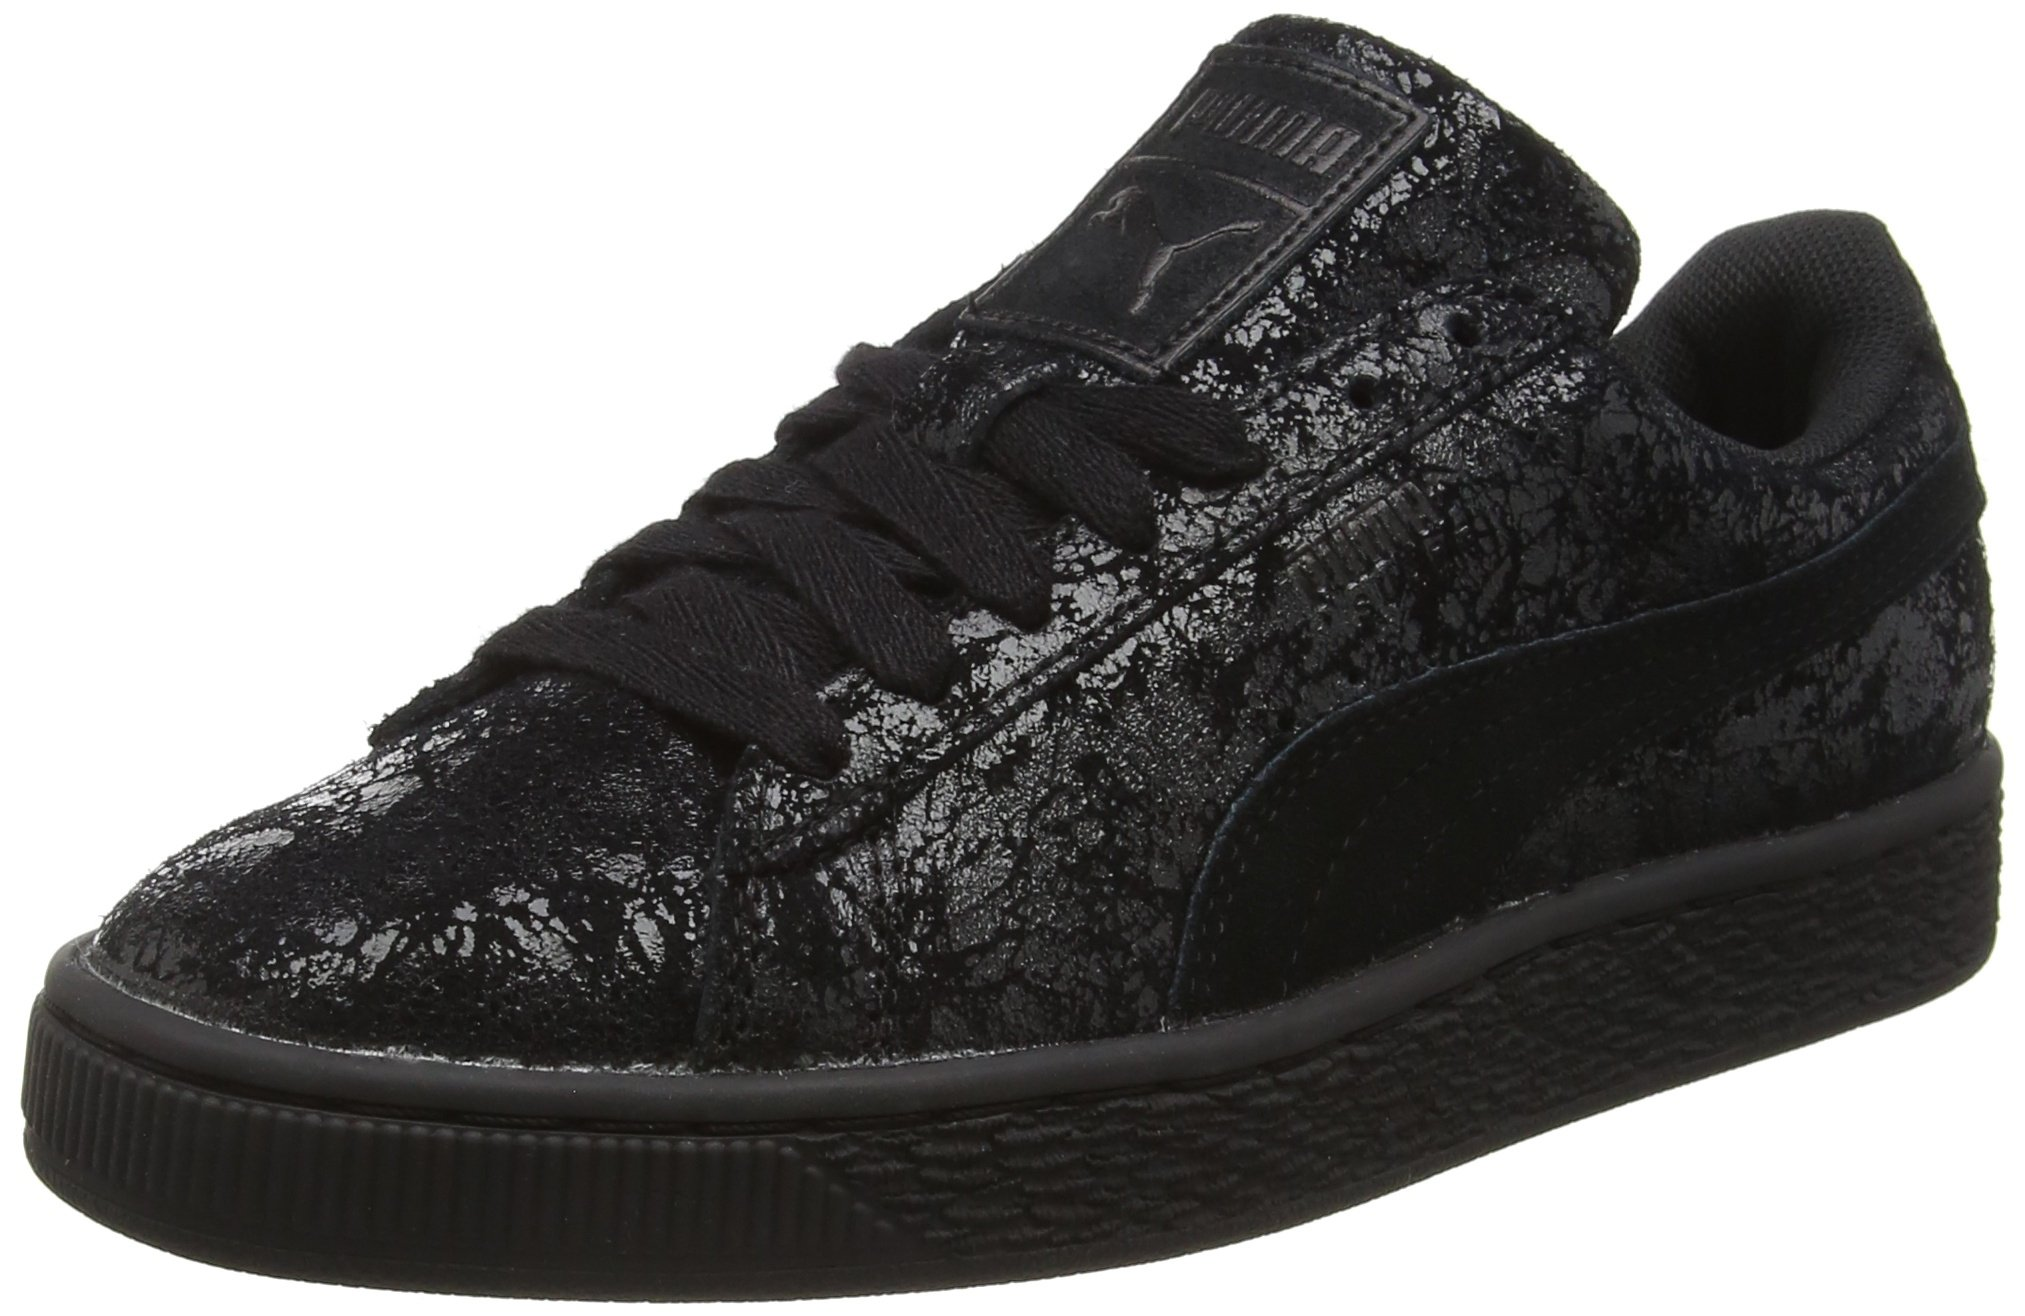 Femme Noirpuma Basses Black Uk 0137 Puma Eu4 Crmstwf6Sneakers 0wOP8Xnk